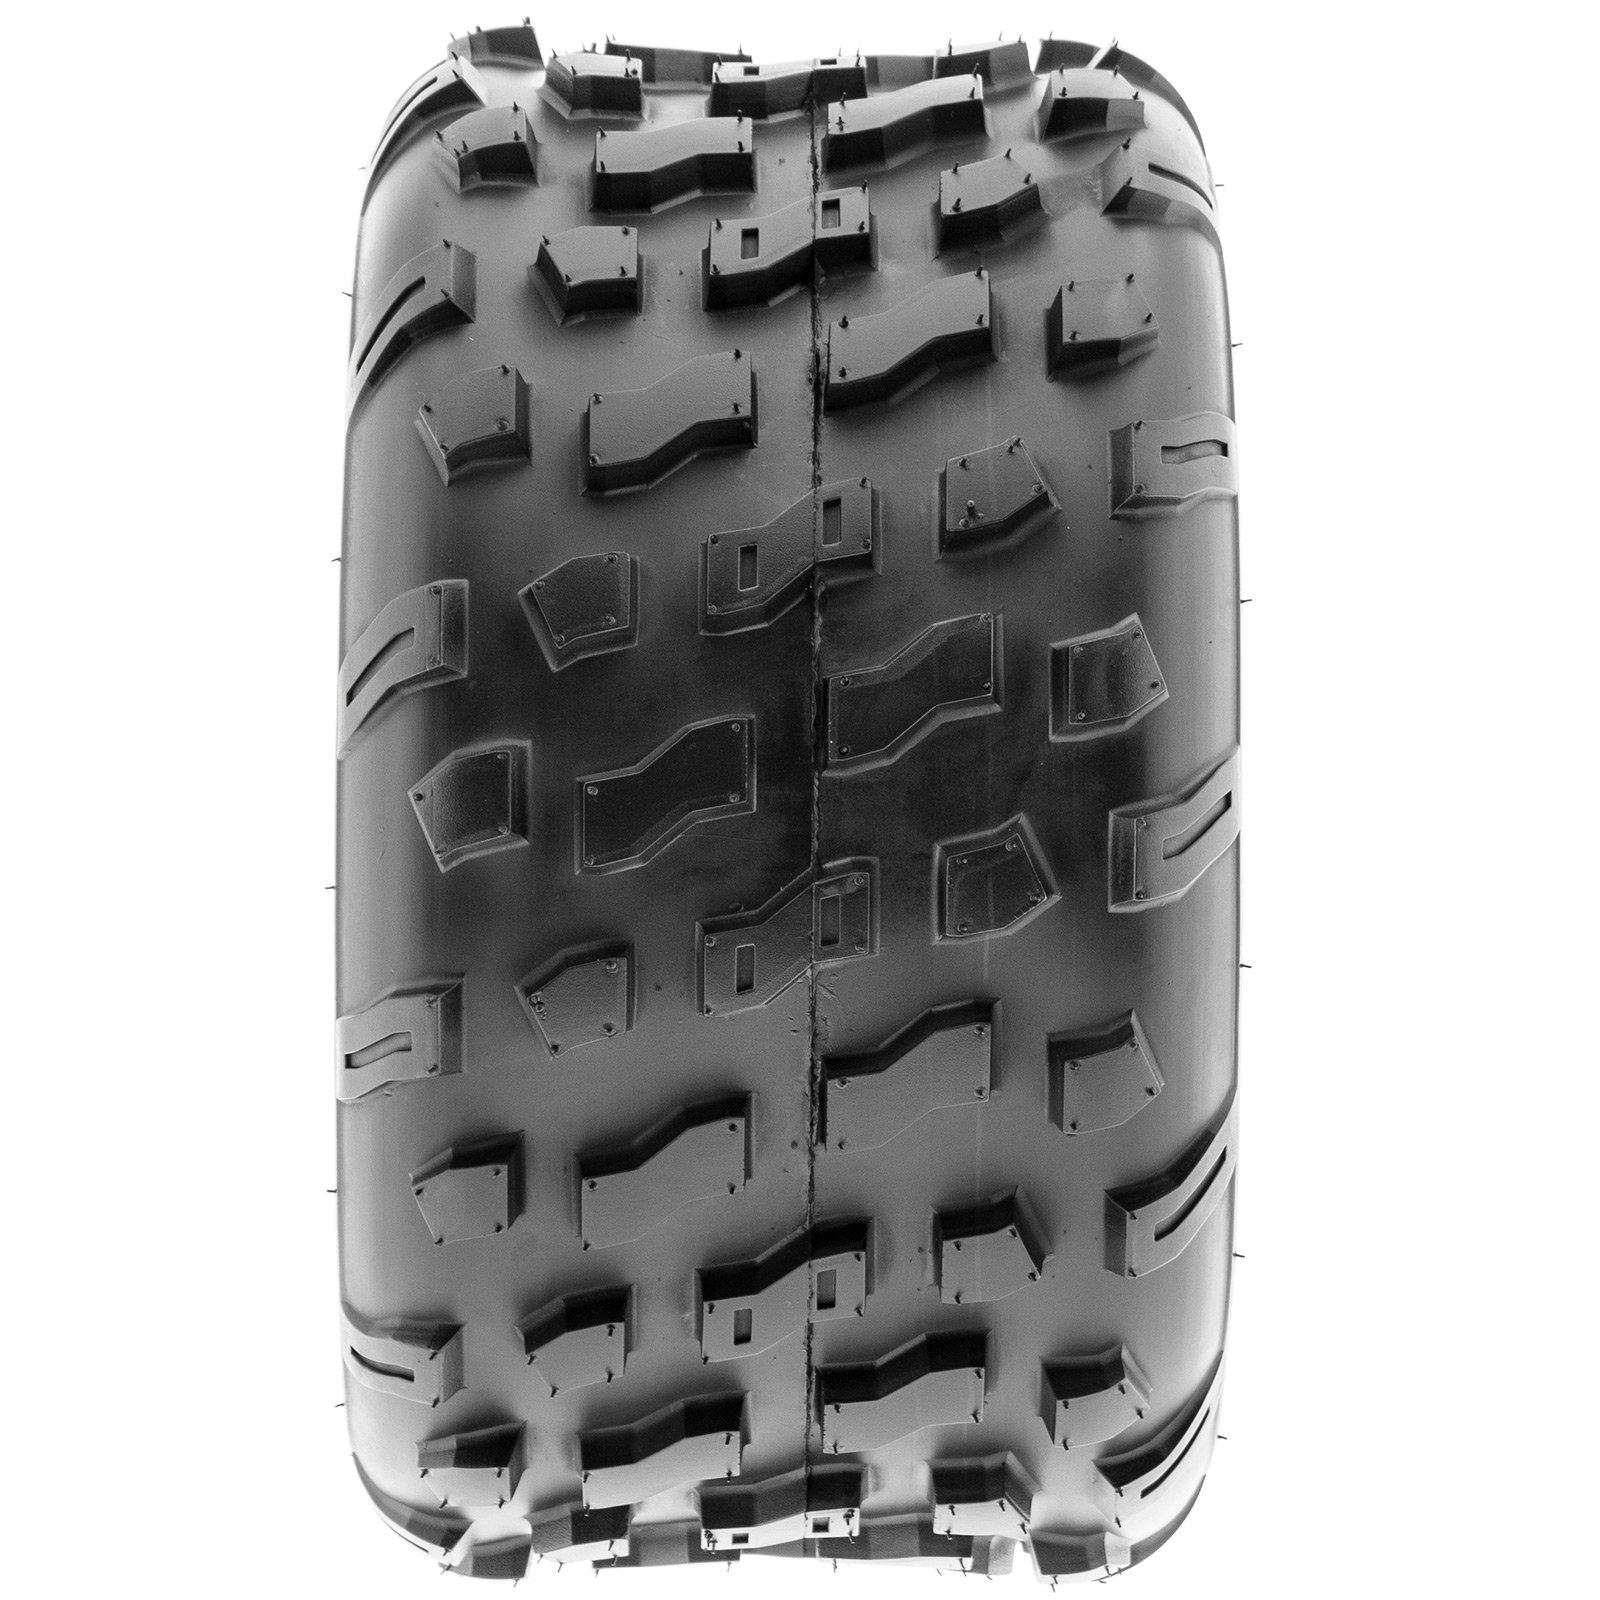 SunF Rear ATV Knobby Tires 20x10-9 20x10x9 4 PR A022 (Set pair of 2) by SunF (Image #8)